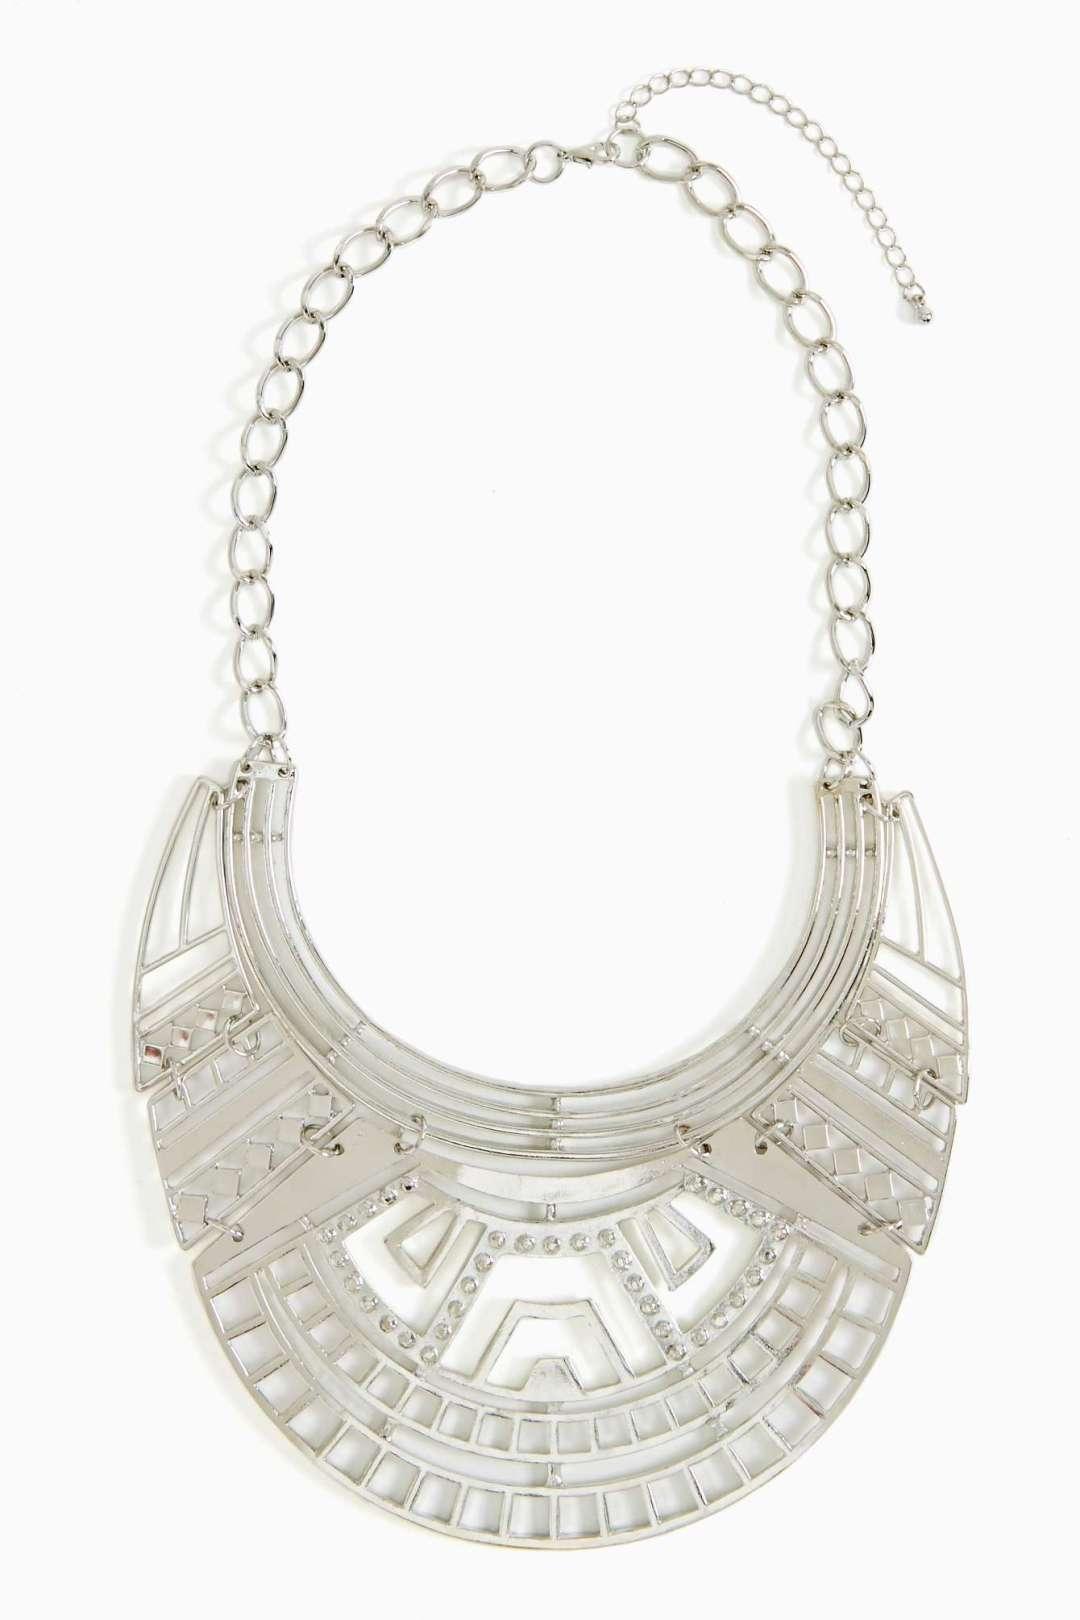 circuitry necklace